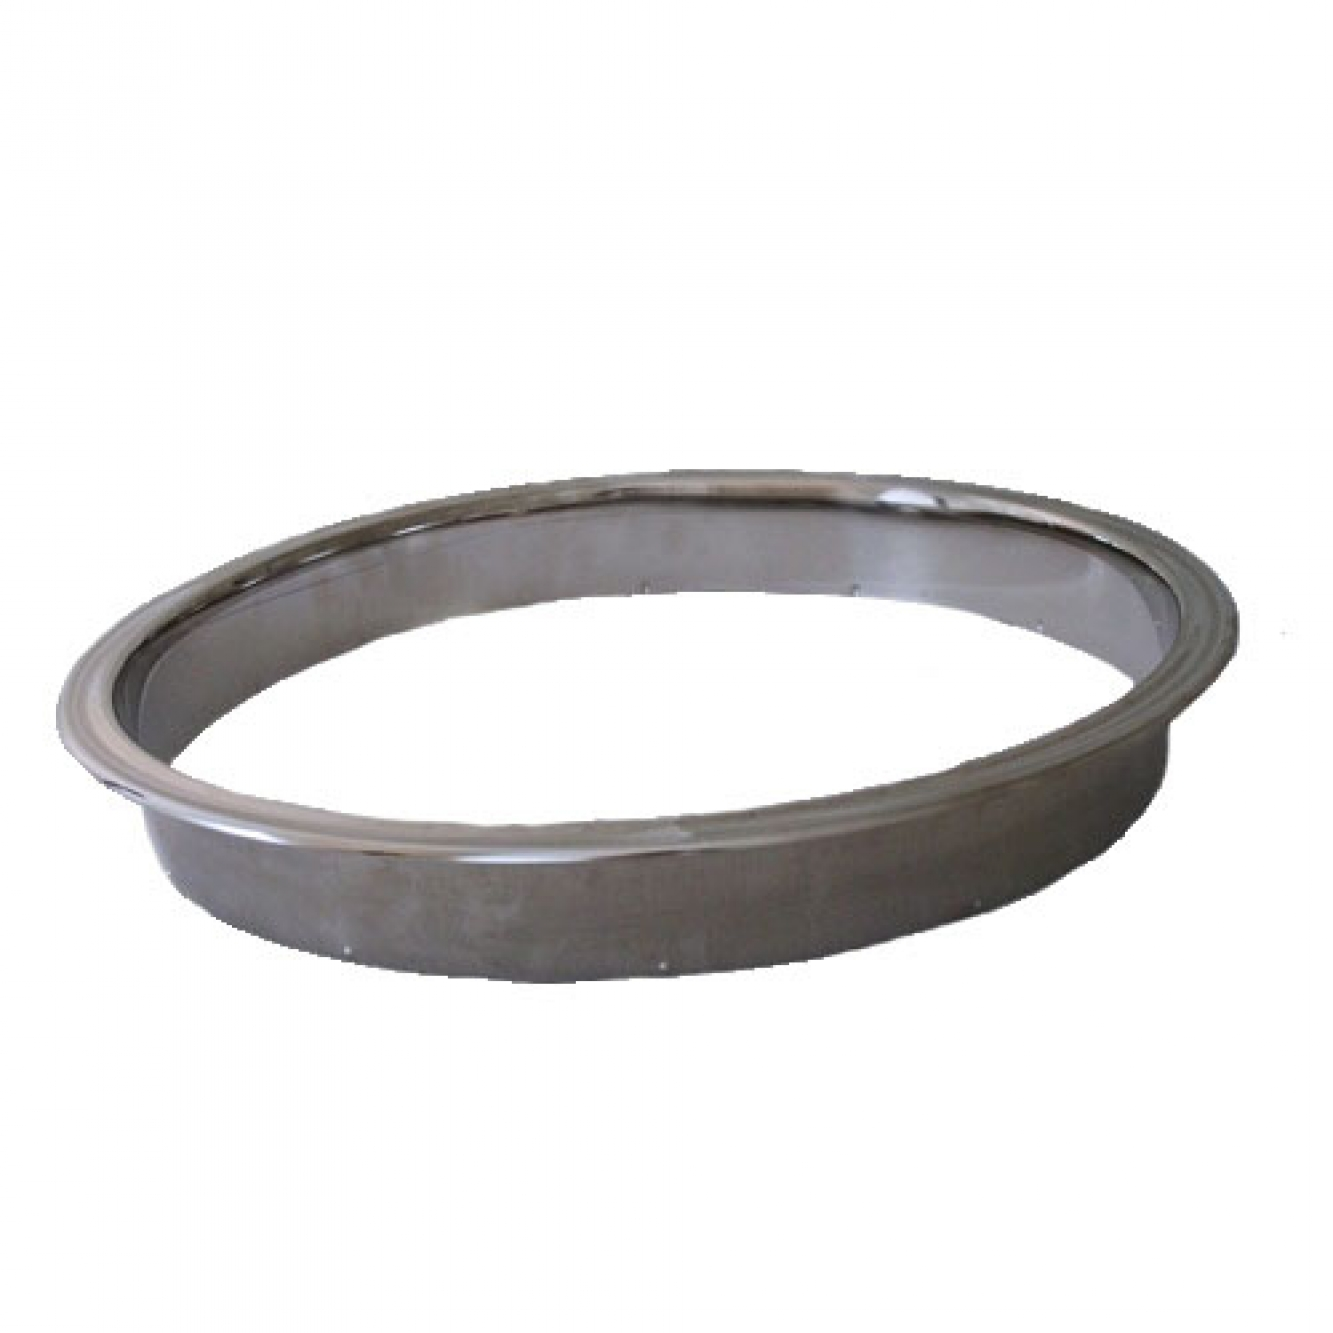 19 pollici BBS in acciaio inox anfahrschutz per BBS ch106